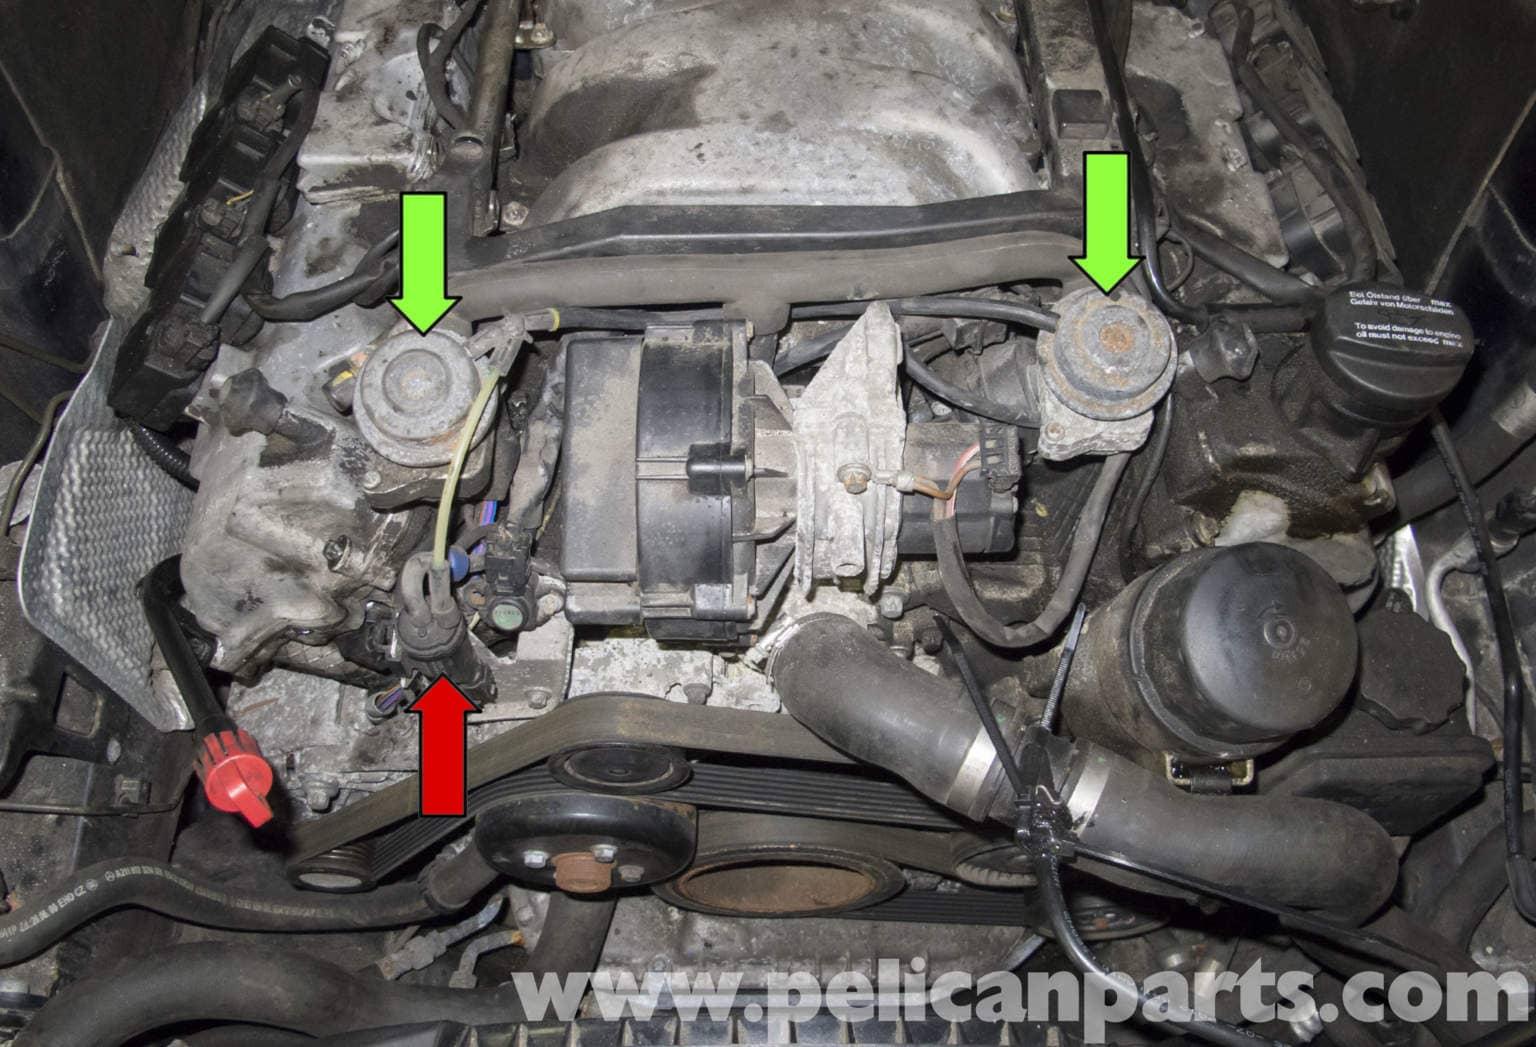 Wiring Schematic 2003 Mercedes W211 Secondary Air Pump from cdn4.pelicanparts.com